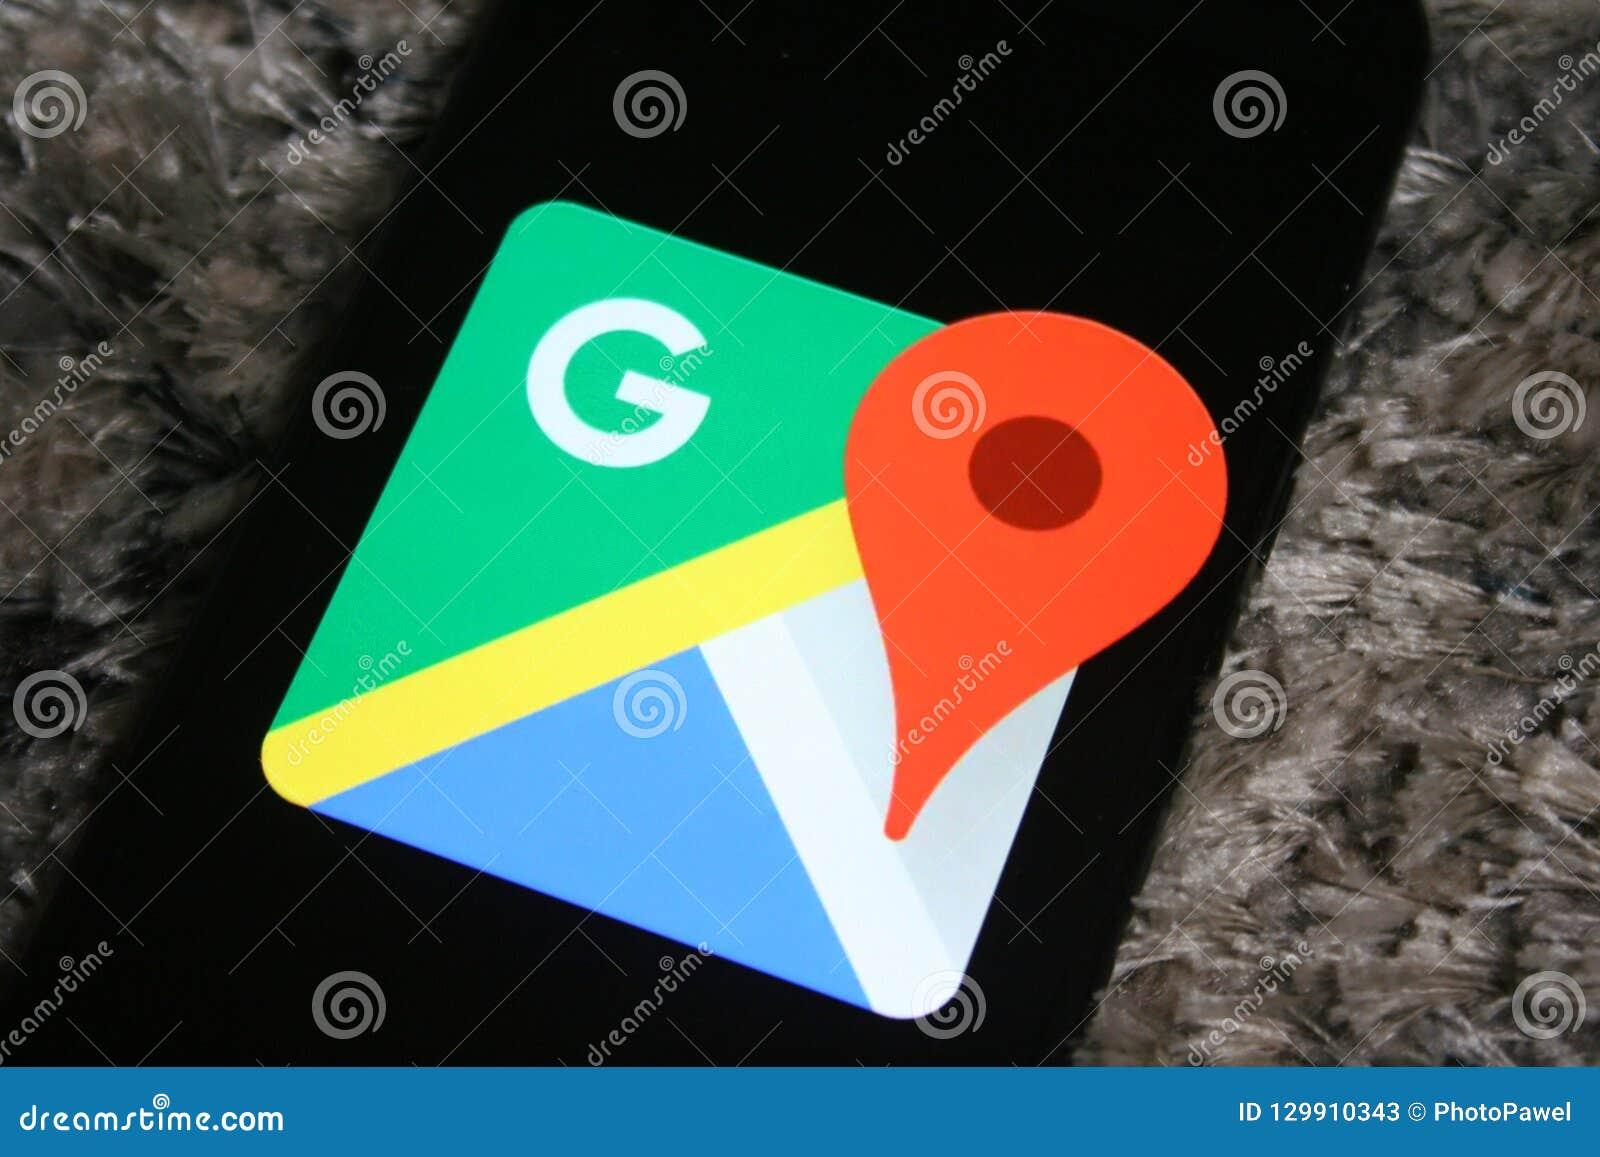 Google Maps Logo App On Samsung Phone Screen Editorial Stock Photo